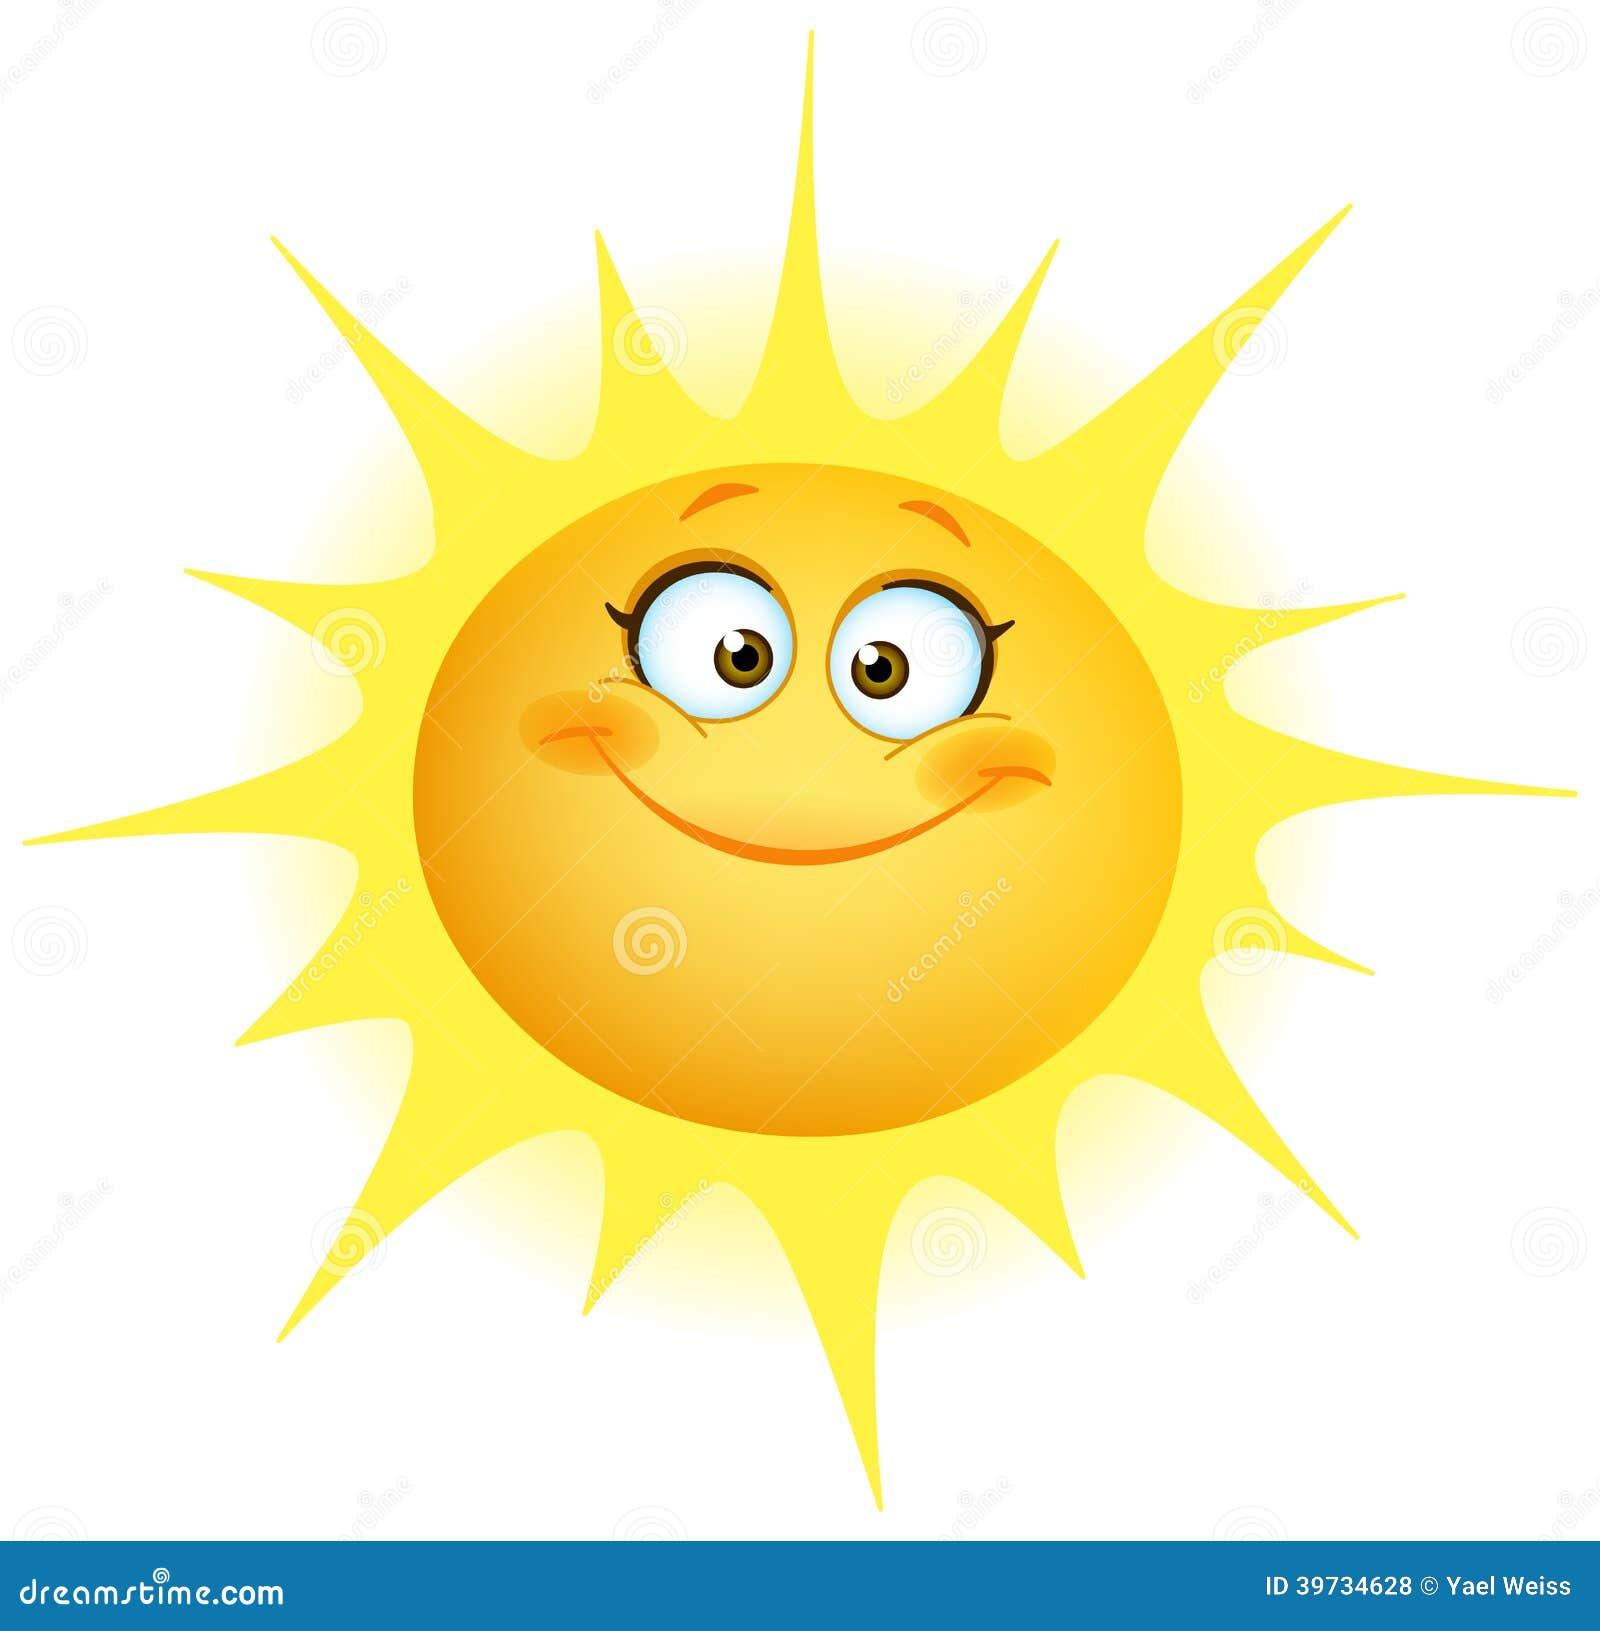 https://thumbs.dreamstime.com/z/cute-sun-illustration-smiling-39734628.jpg